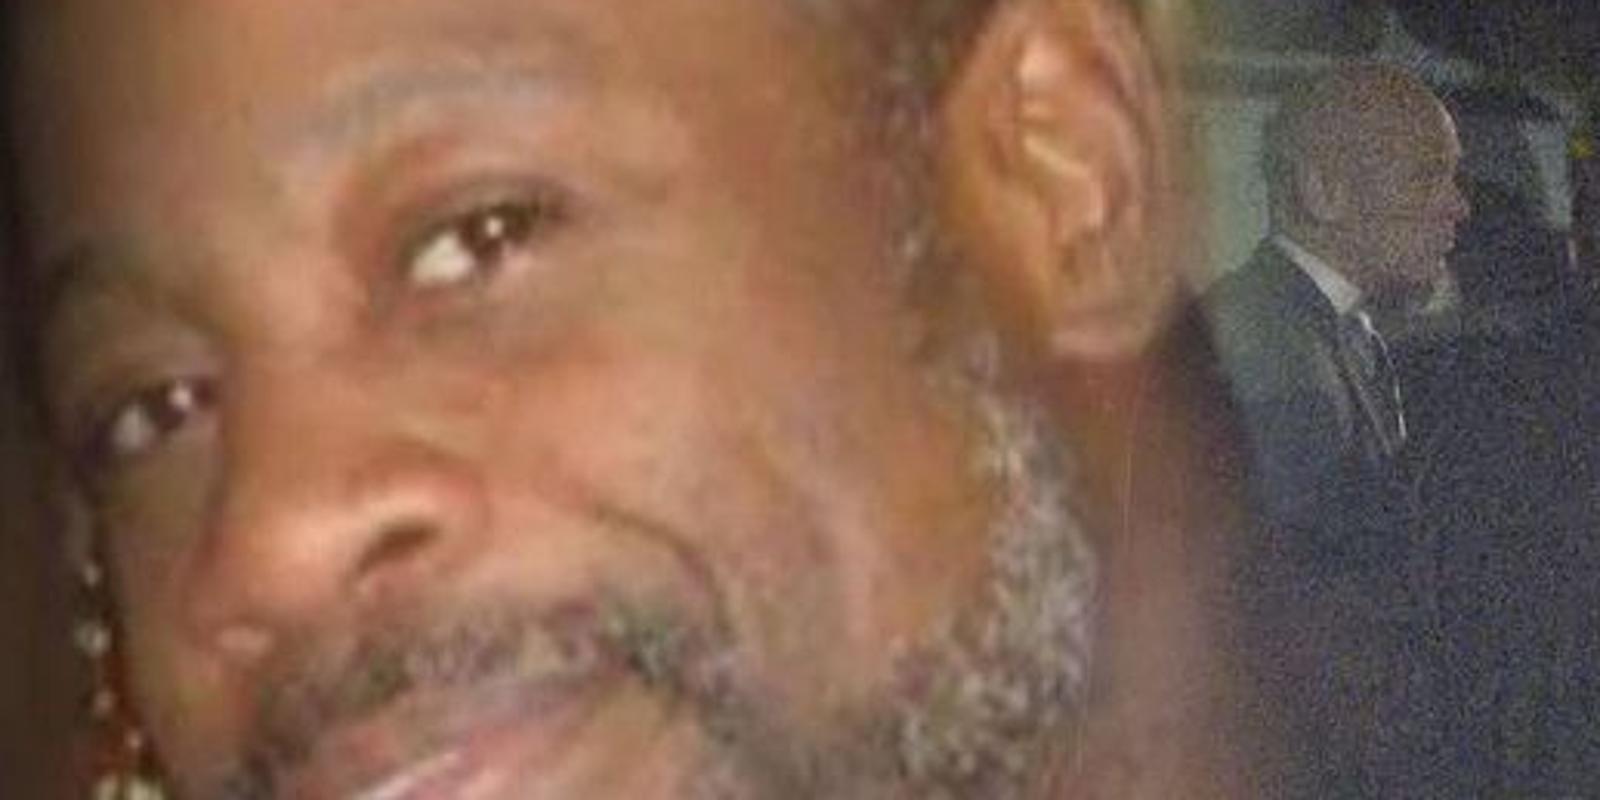 DeKalb County grand jury heard testimony on December shooting